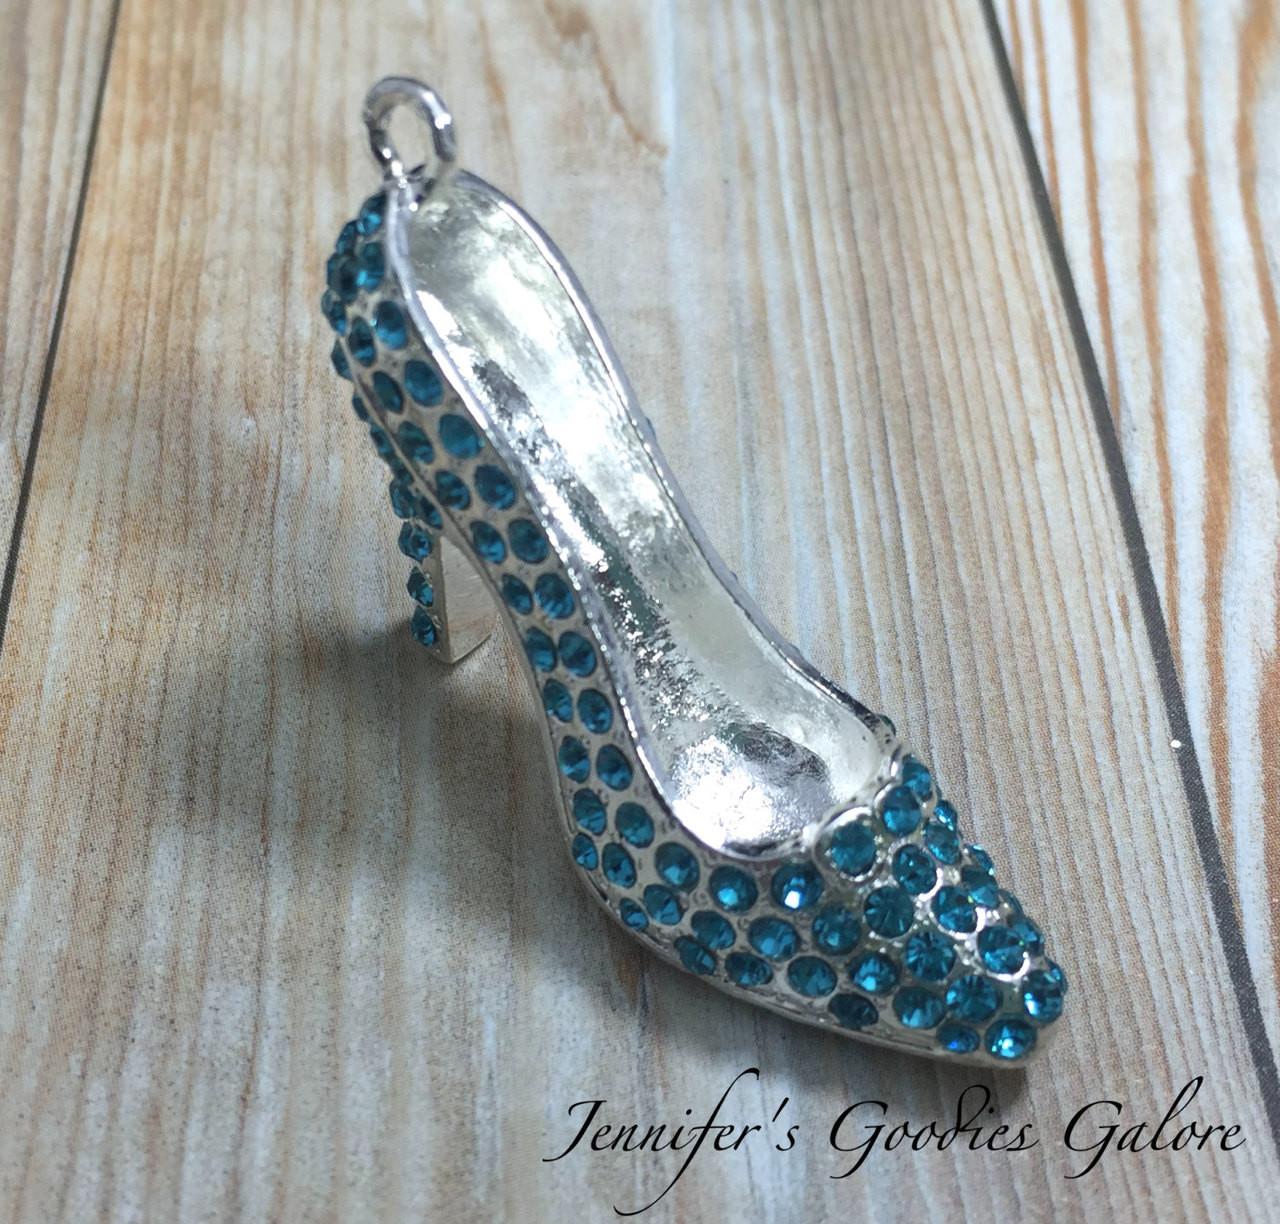 43mm turquoise shoe pendant cinderella pendant glass slipper 43mm turquoise shoe pendant cinderella pendant glass slipper rhinestone pendant chunky aloadofball Gallery